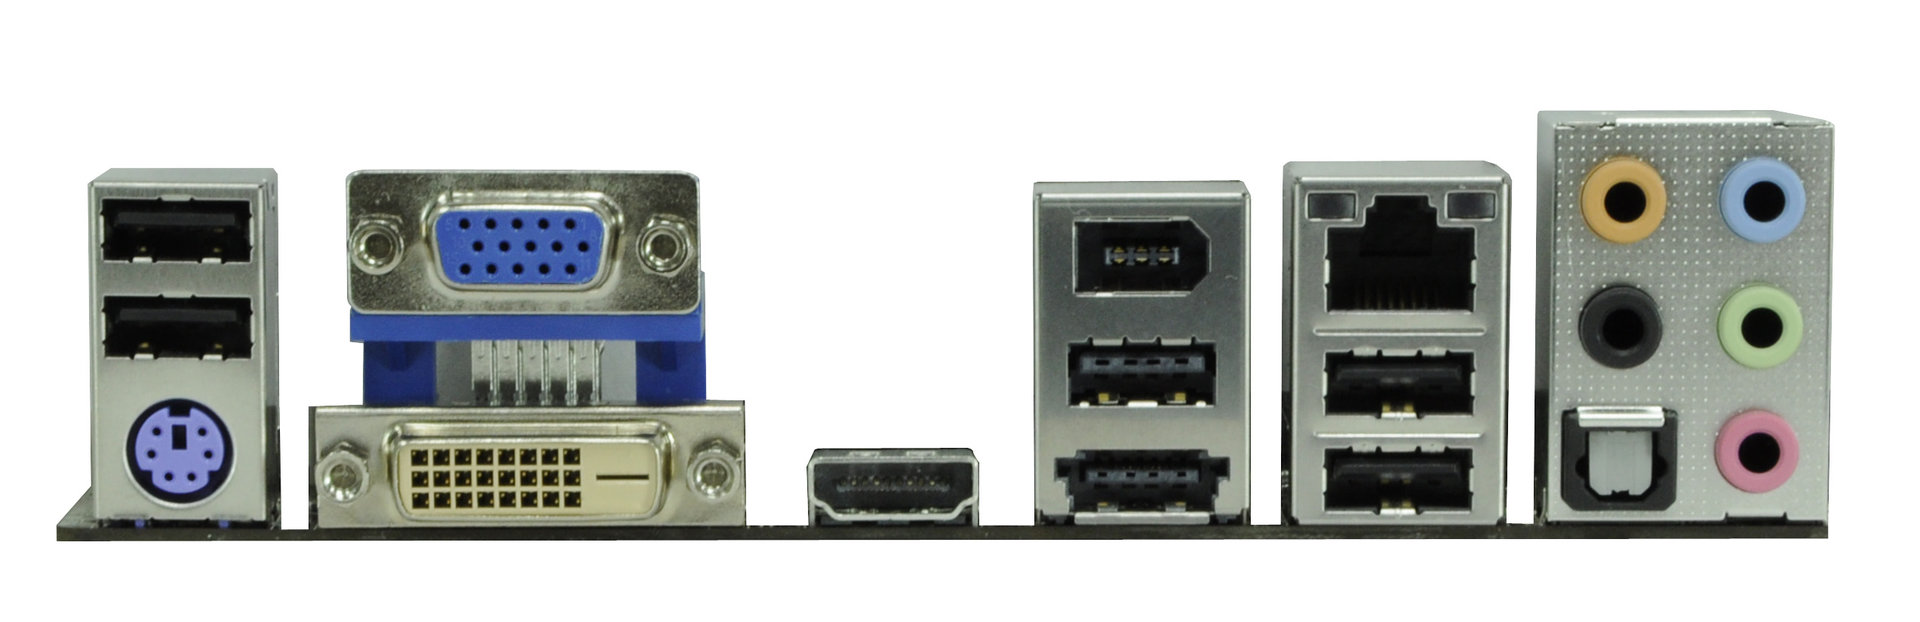 H55M Pro I/O-Panel